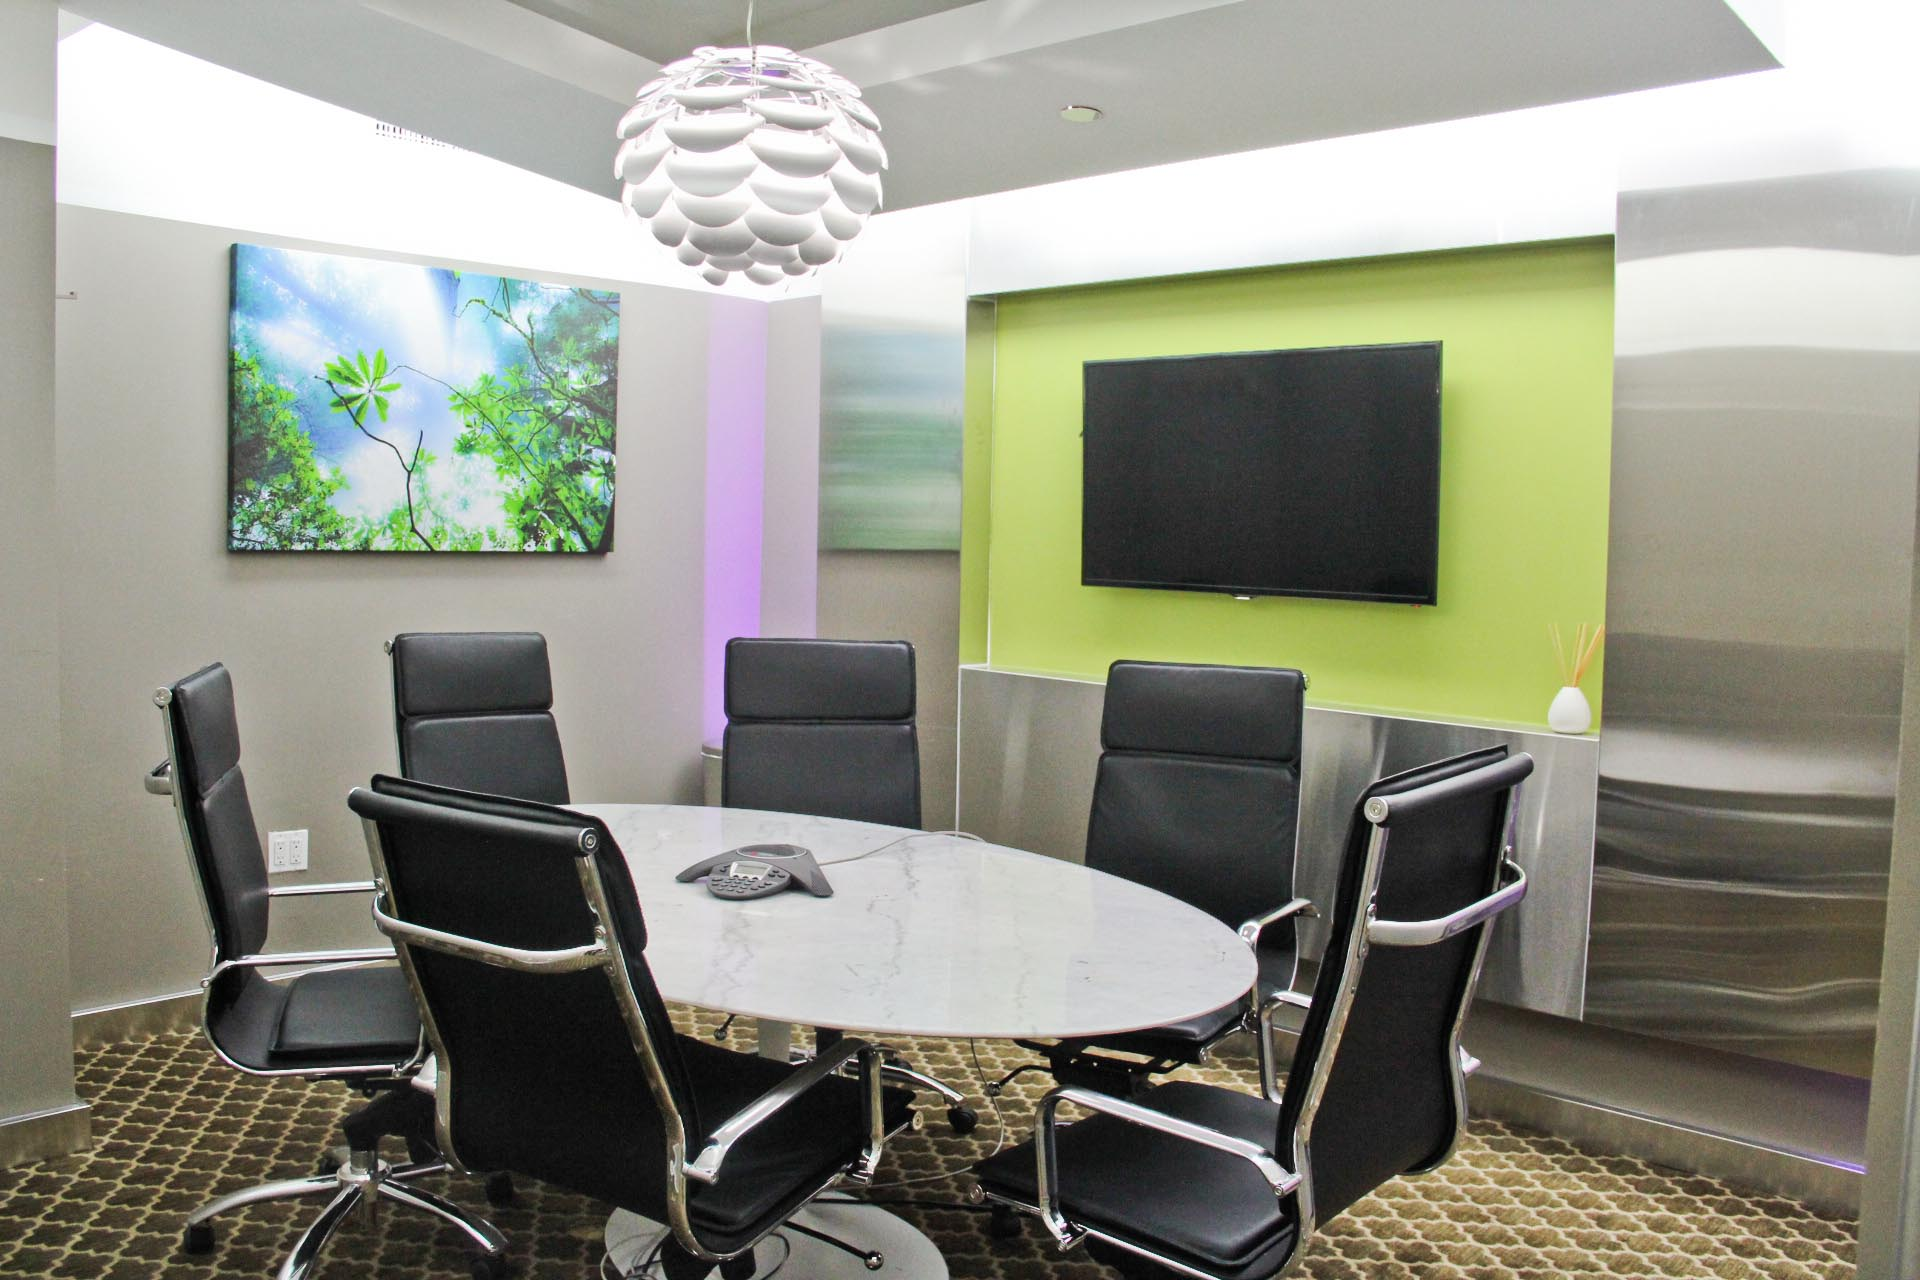 Reserve Conference Room Rental NYC | Meeting Space NYC Rental ...